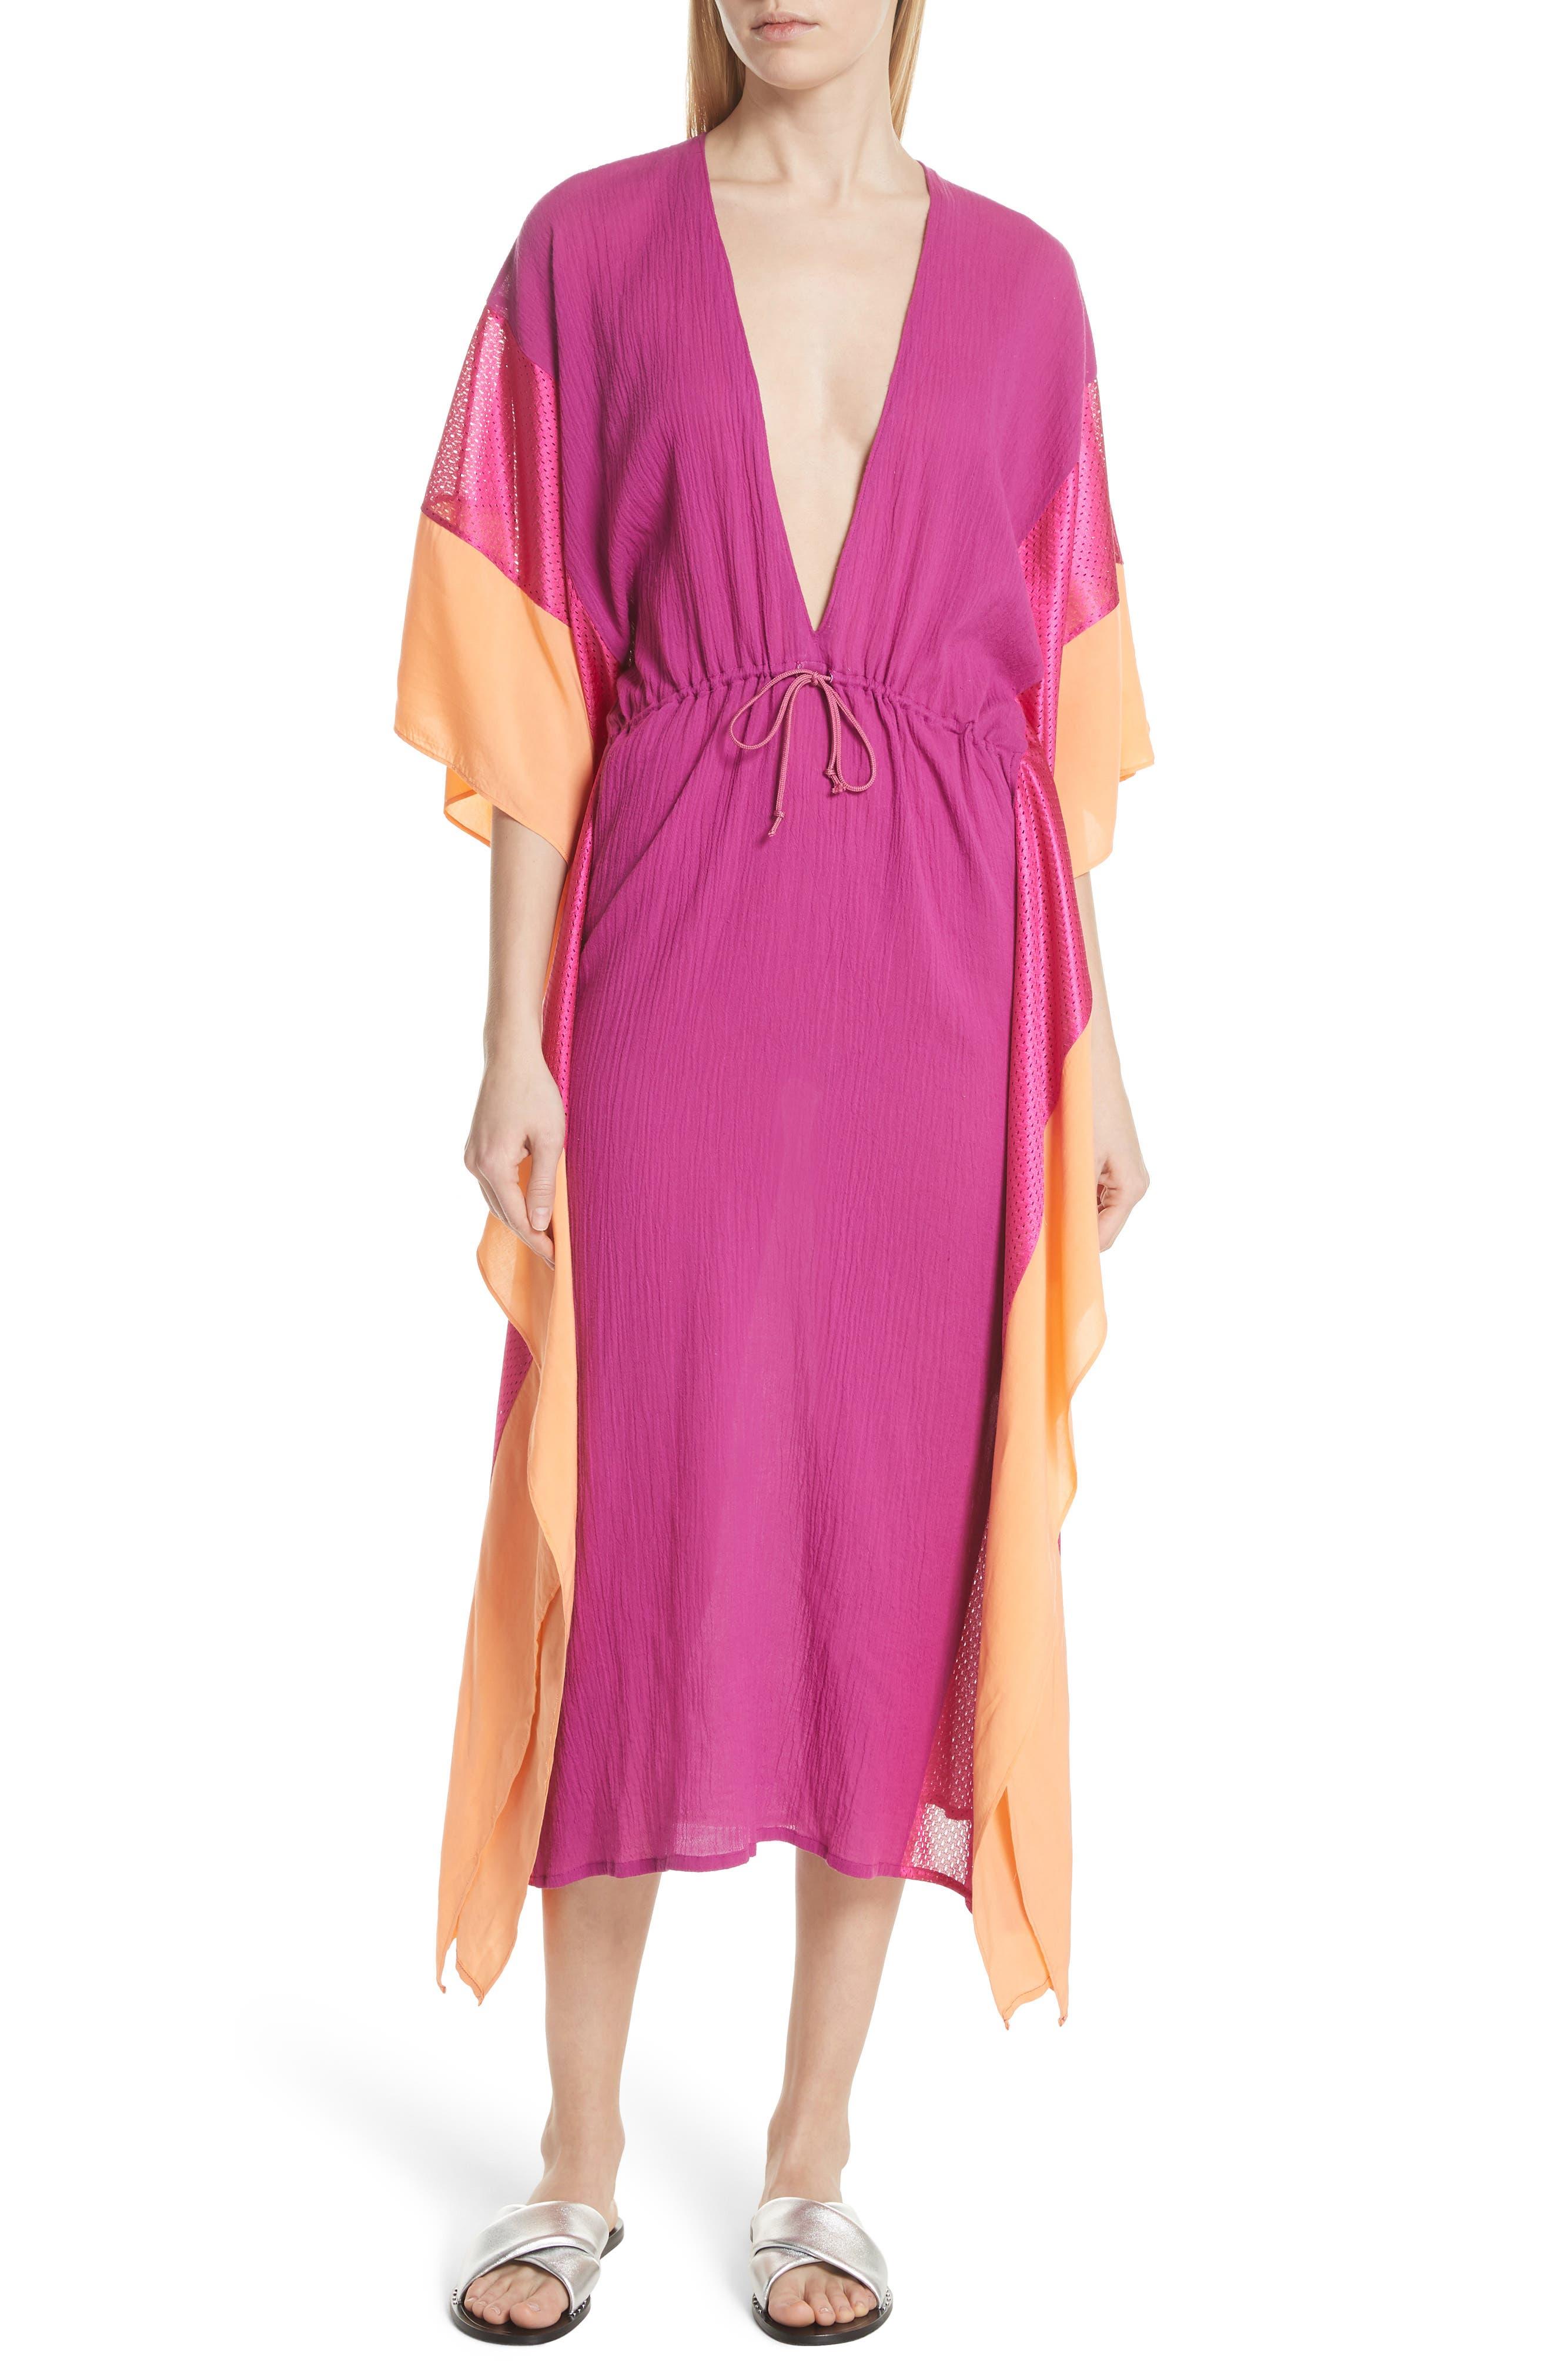 Sun Dance Caftan Dress,                         Main,                         color, Magenta/ Orange